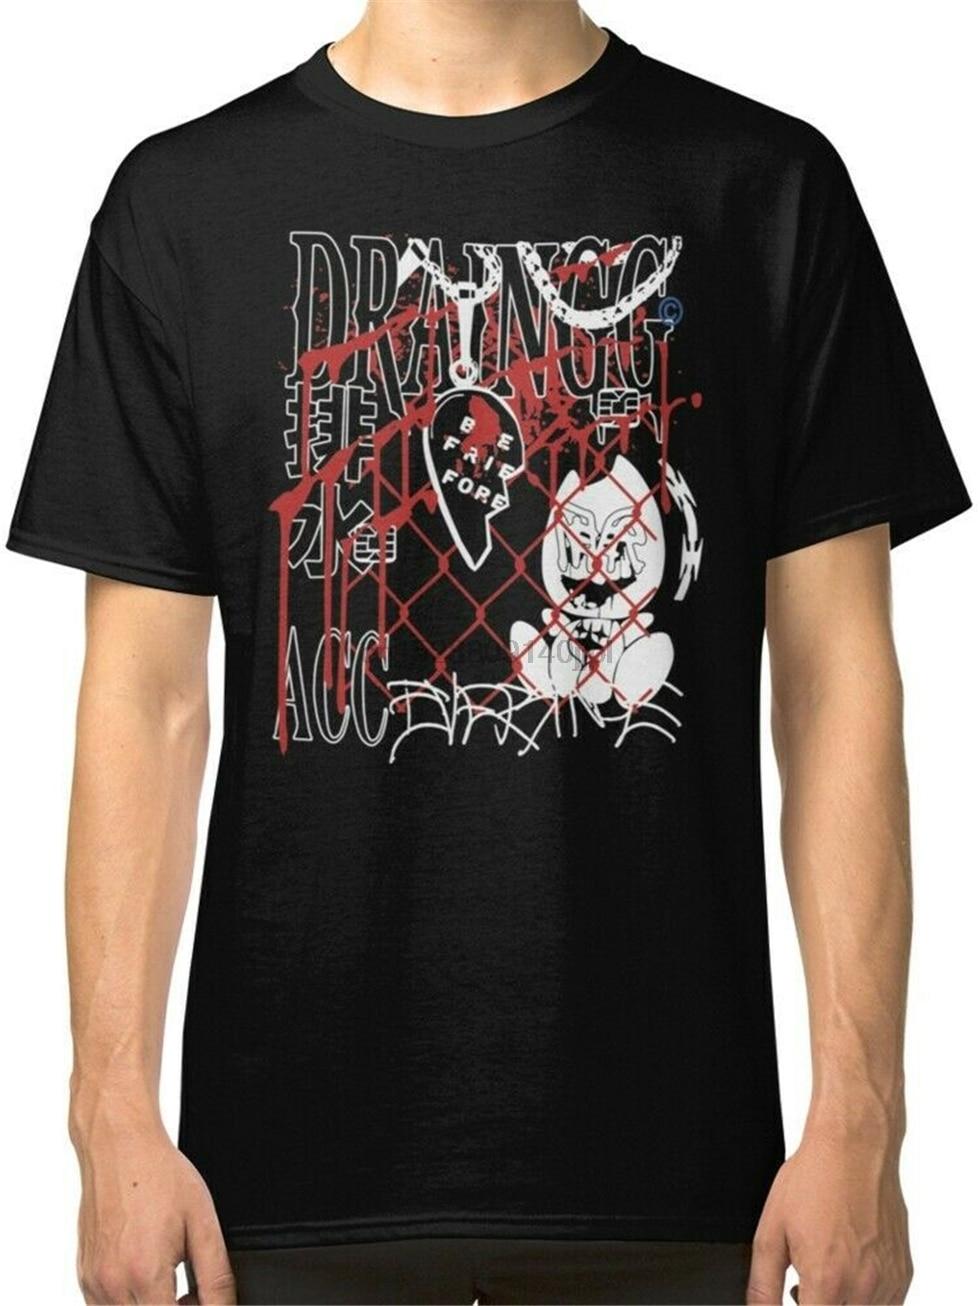 Drenaje de la banda Merch negra para hombre Camiseta S a 3Xl ropa Casual camiseta